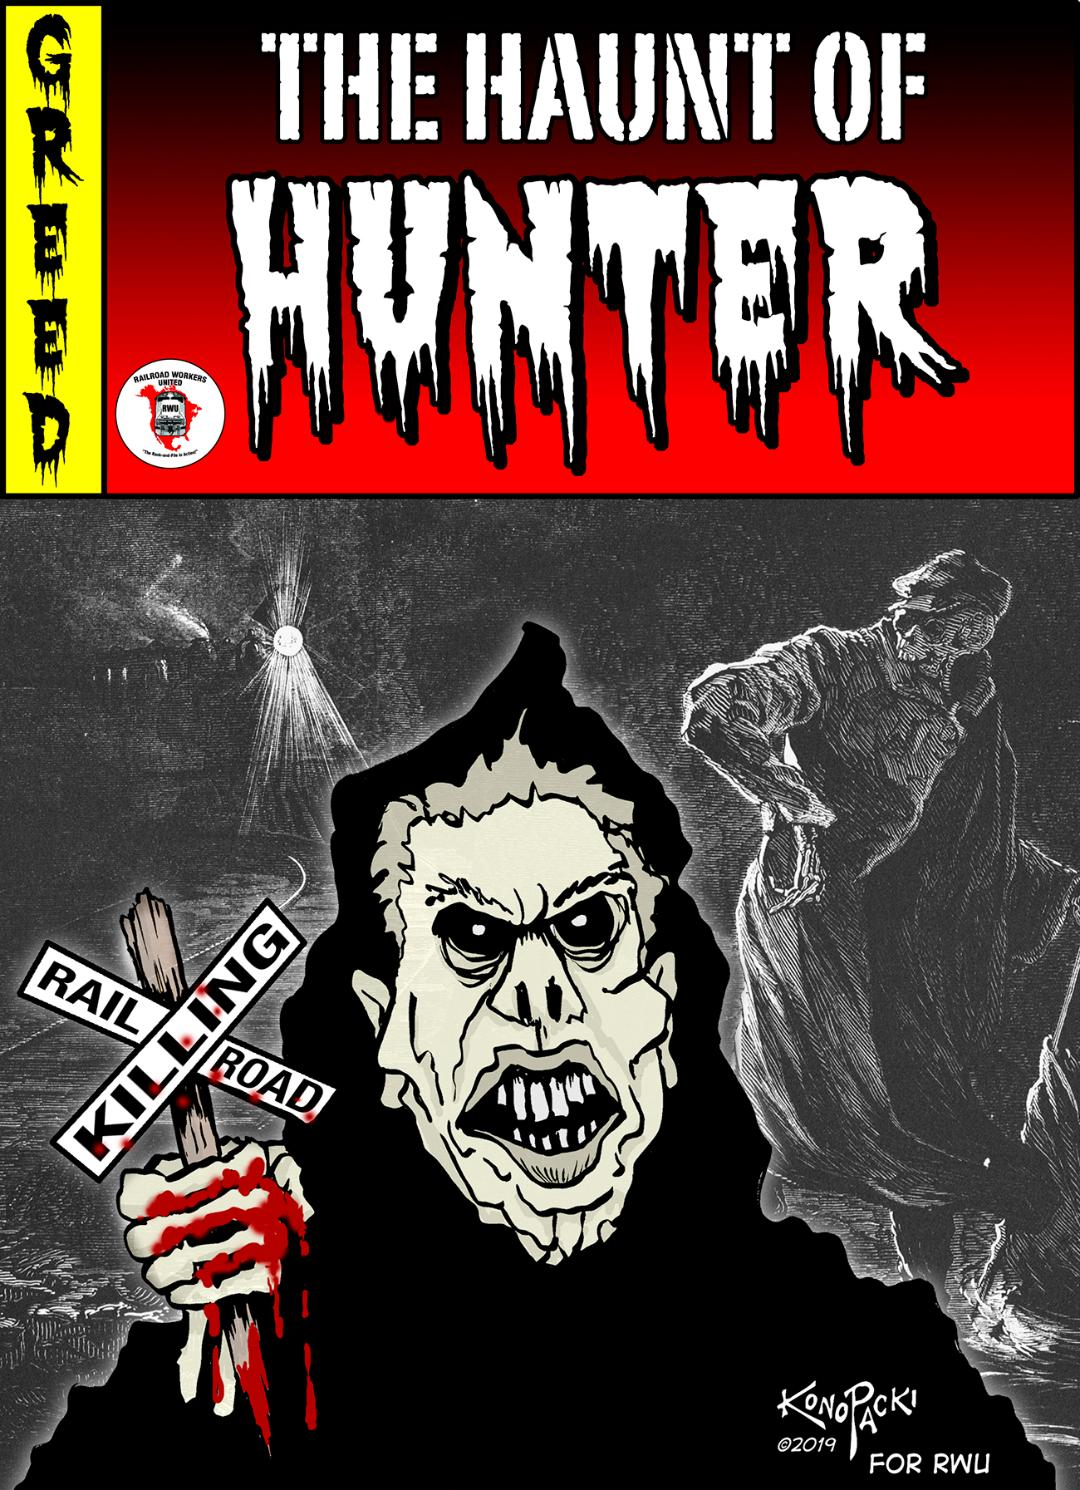 The Haunt of Hunter Cartoon with Blood 2.jpg